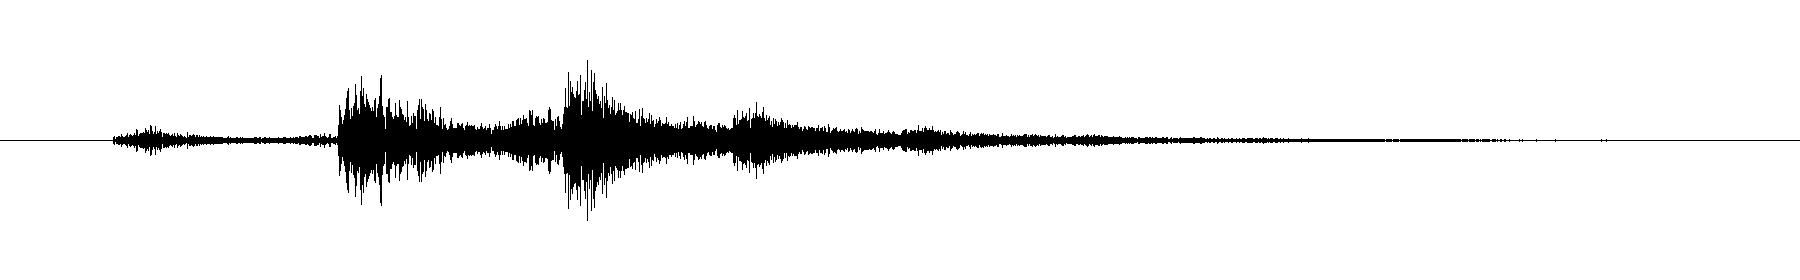 fx 06